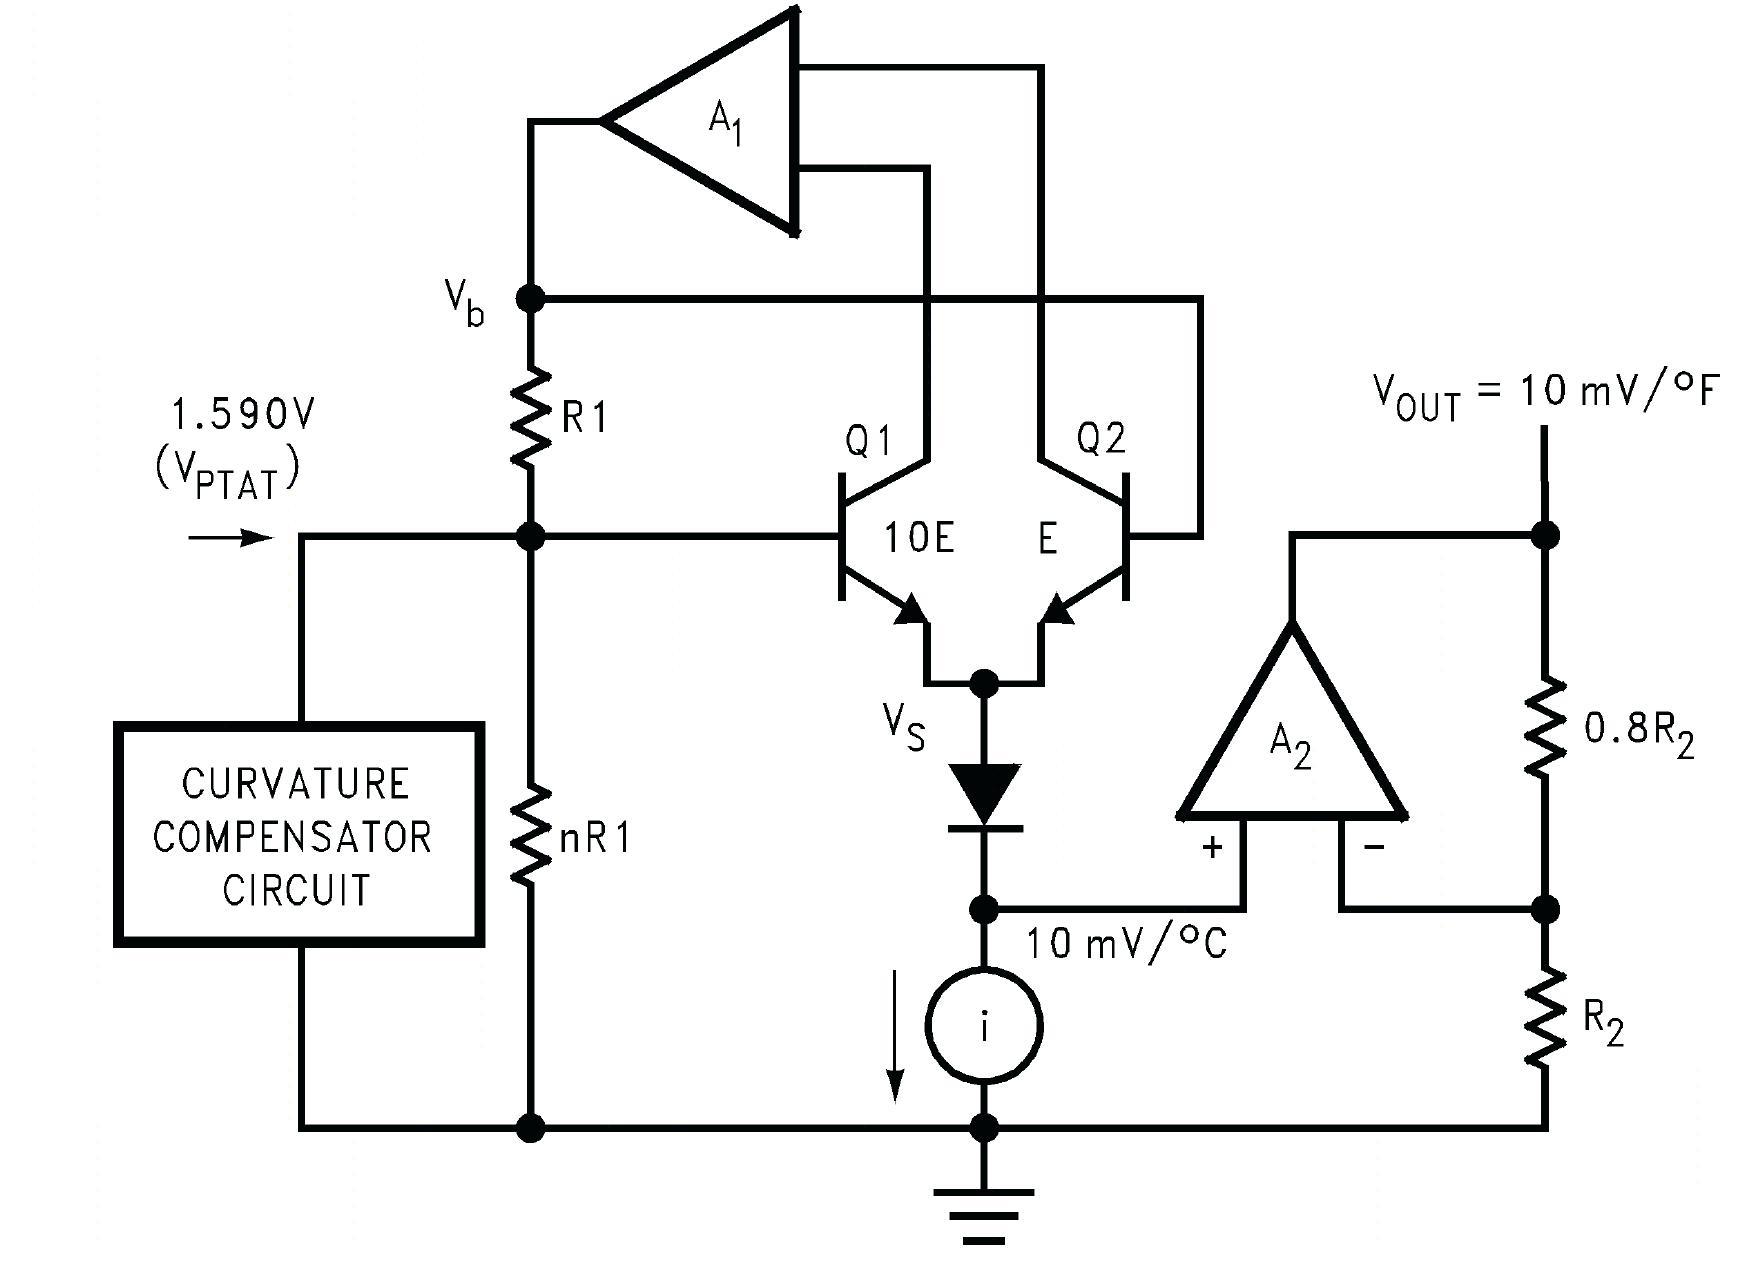 asco 918 wiring diagram Collection-Asco 918 Wiring Diagram 7-p